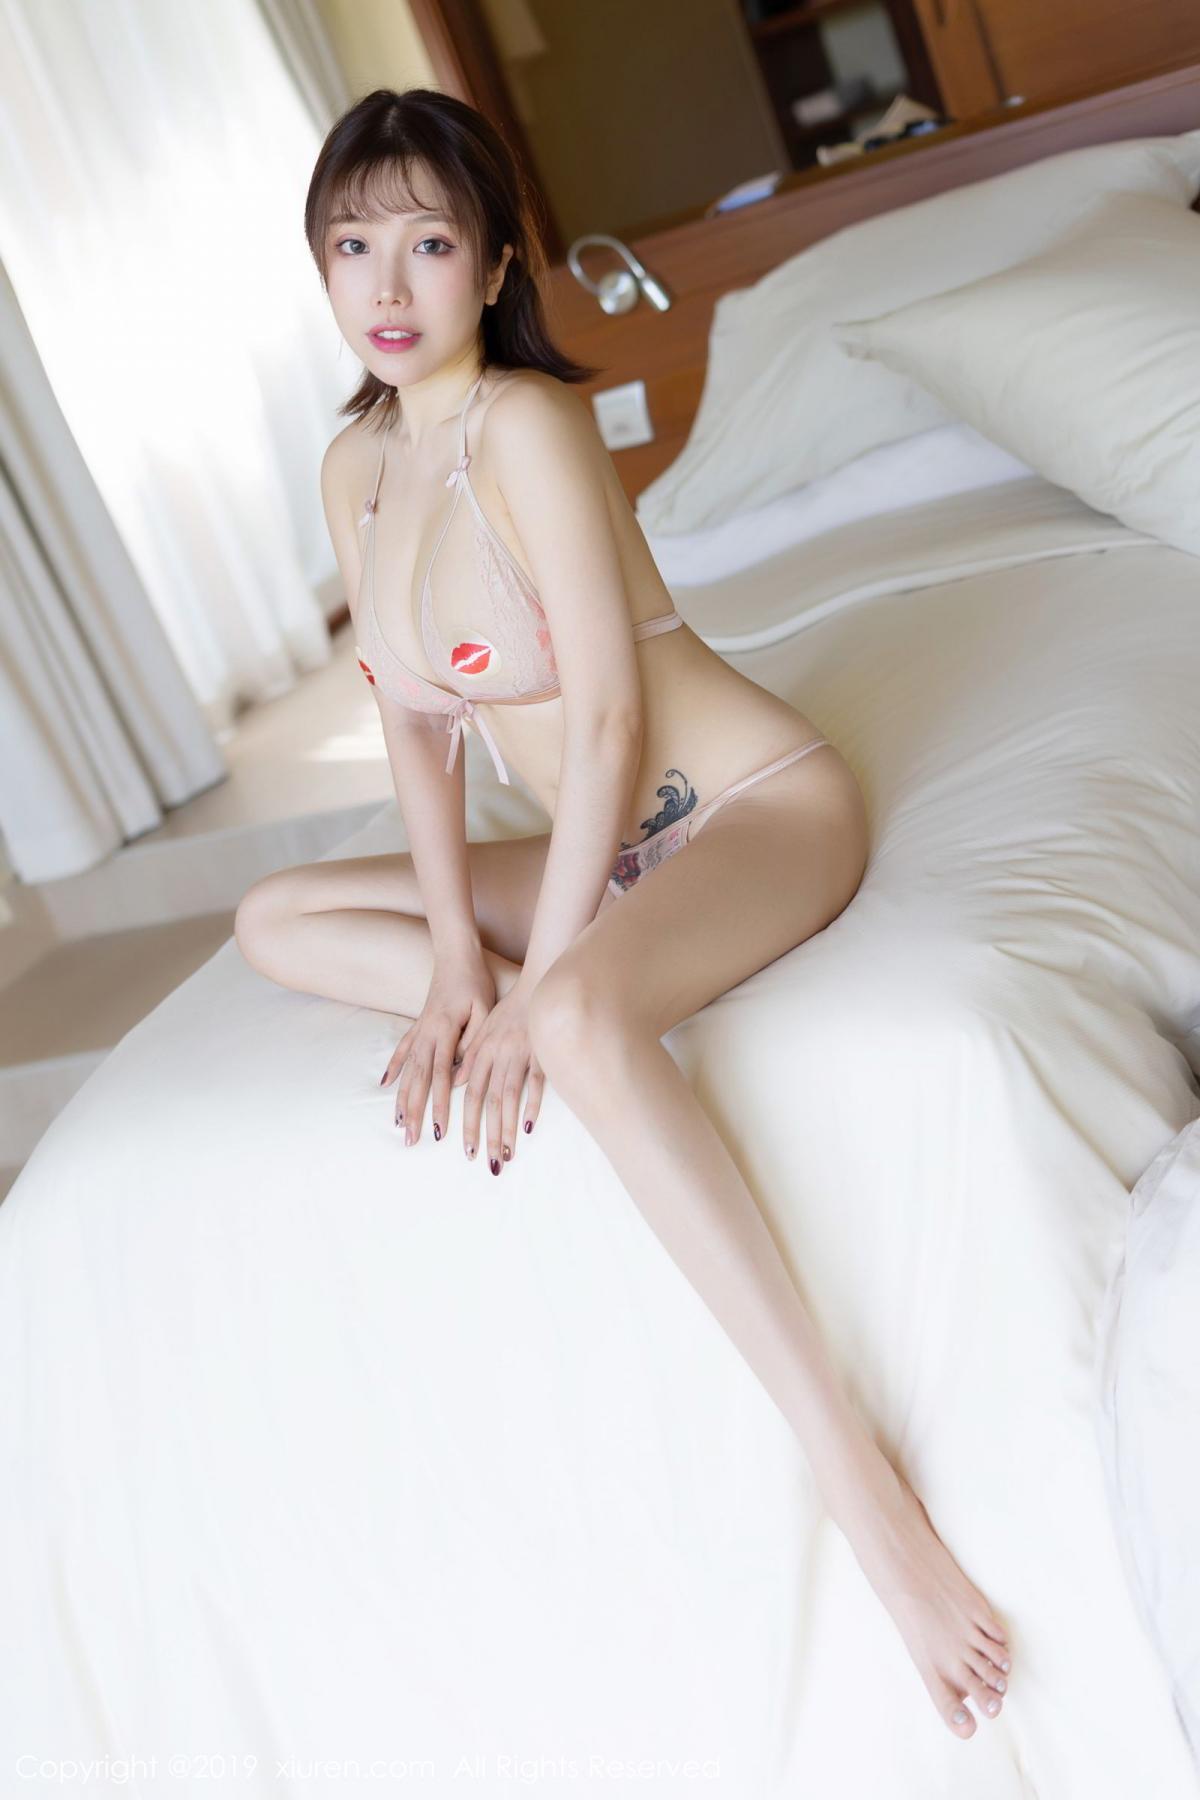 [XiuRen] Vol.1671 Huang Le Ran 1P, Adult, Huang Le Ran, Underwear, Xiuren